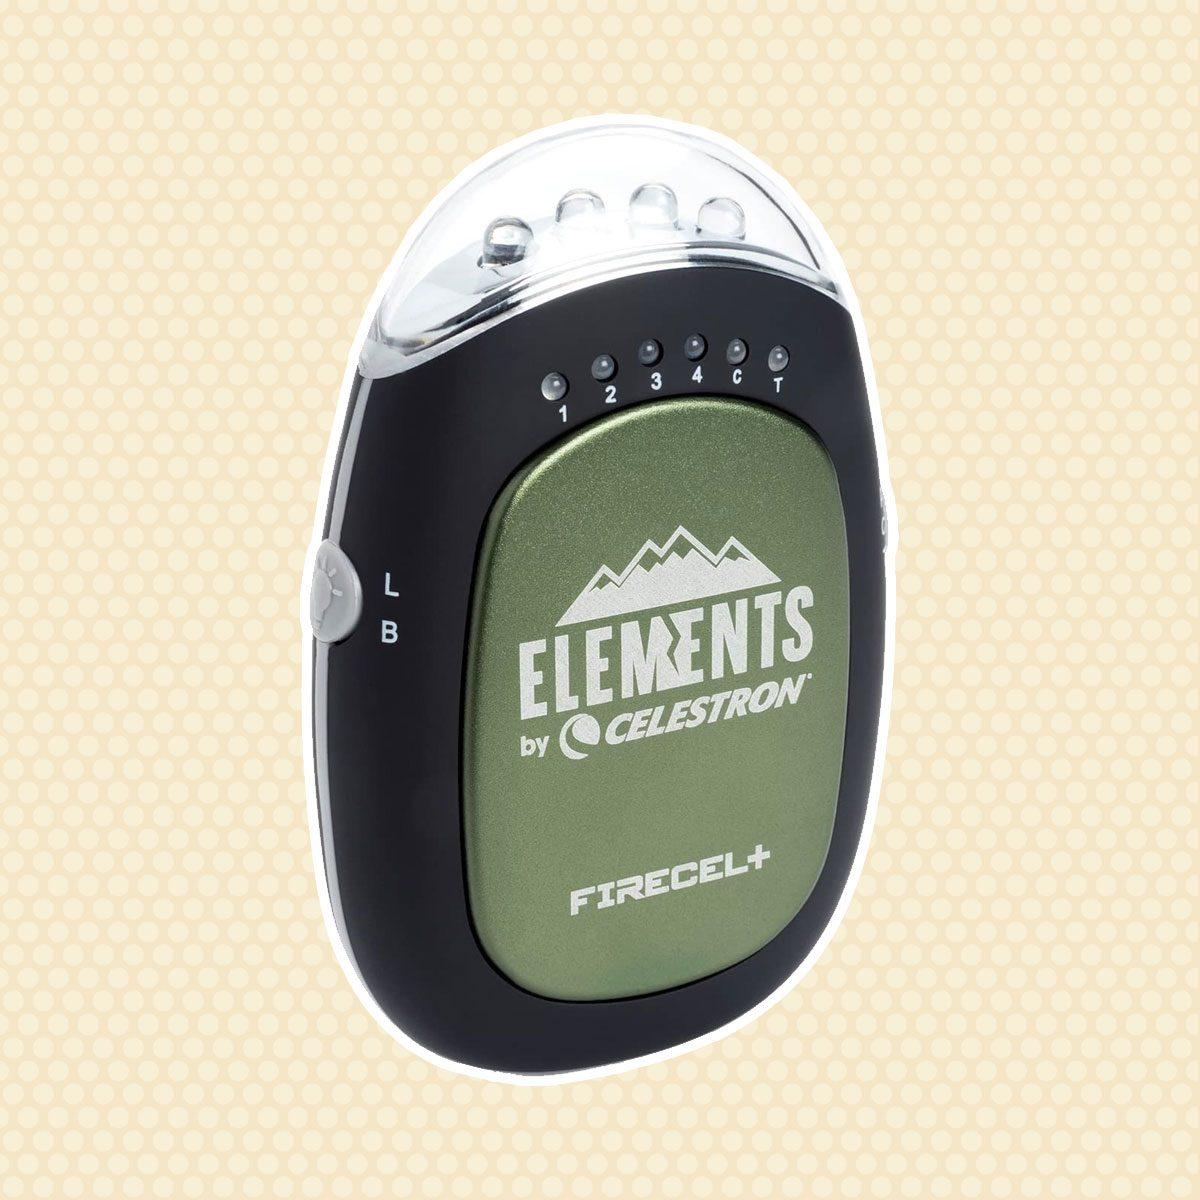 Celestron FireCel Plus - Hand Warmer/Charger/Flashlight, Green (93544)